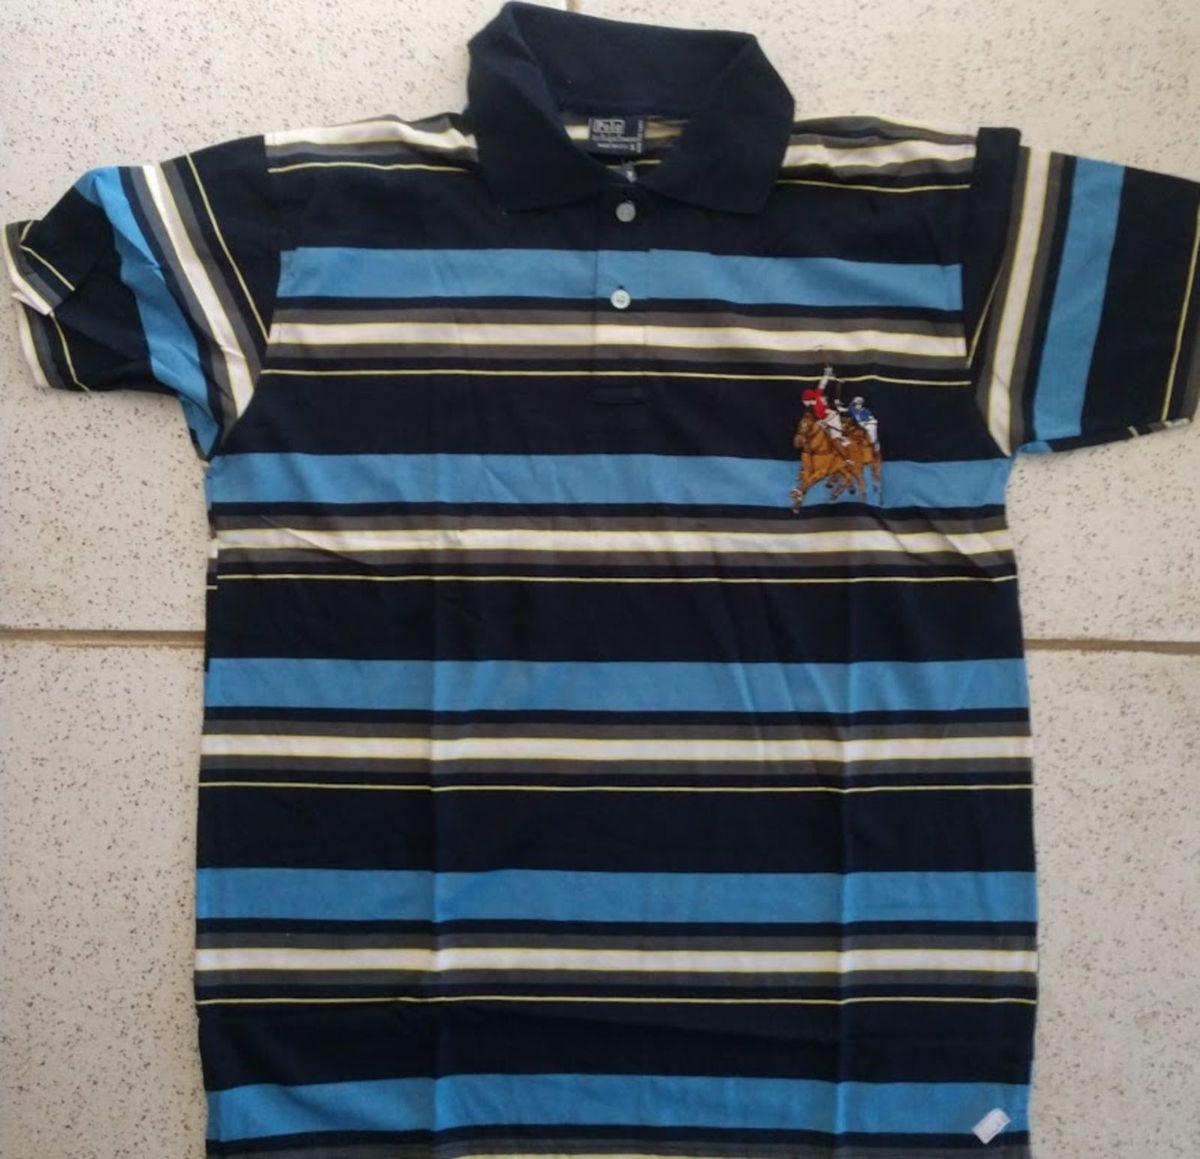 camisa polo ralph lauren listrada com tamanho p - camisetas ralph lauren fcfb7da3695